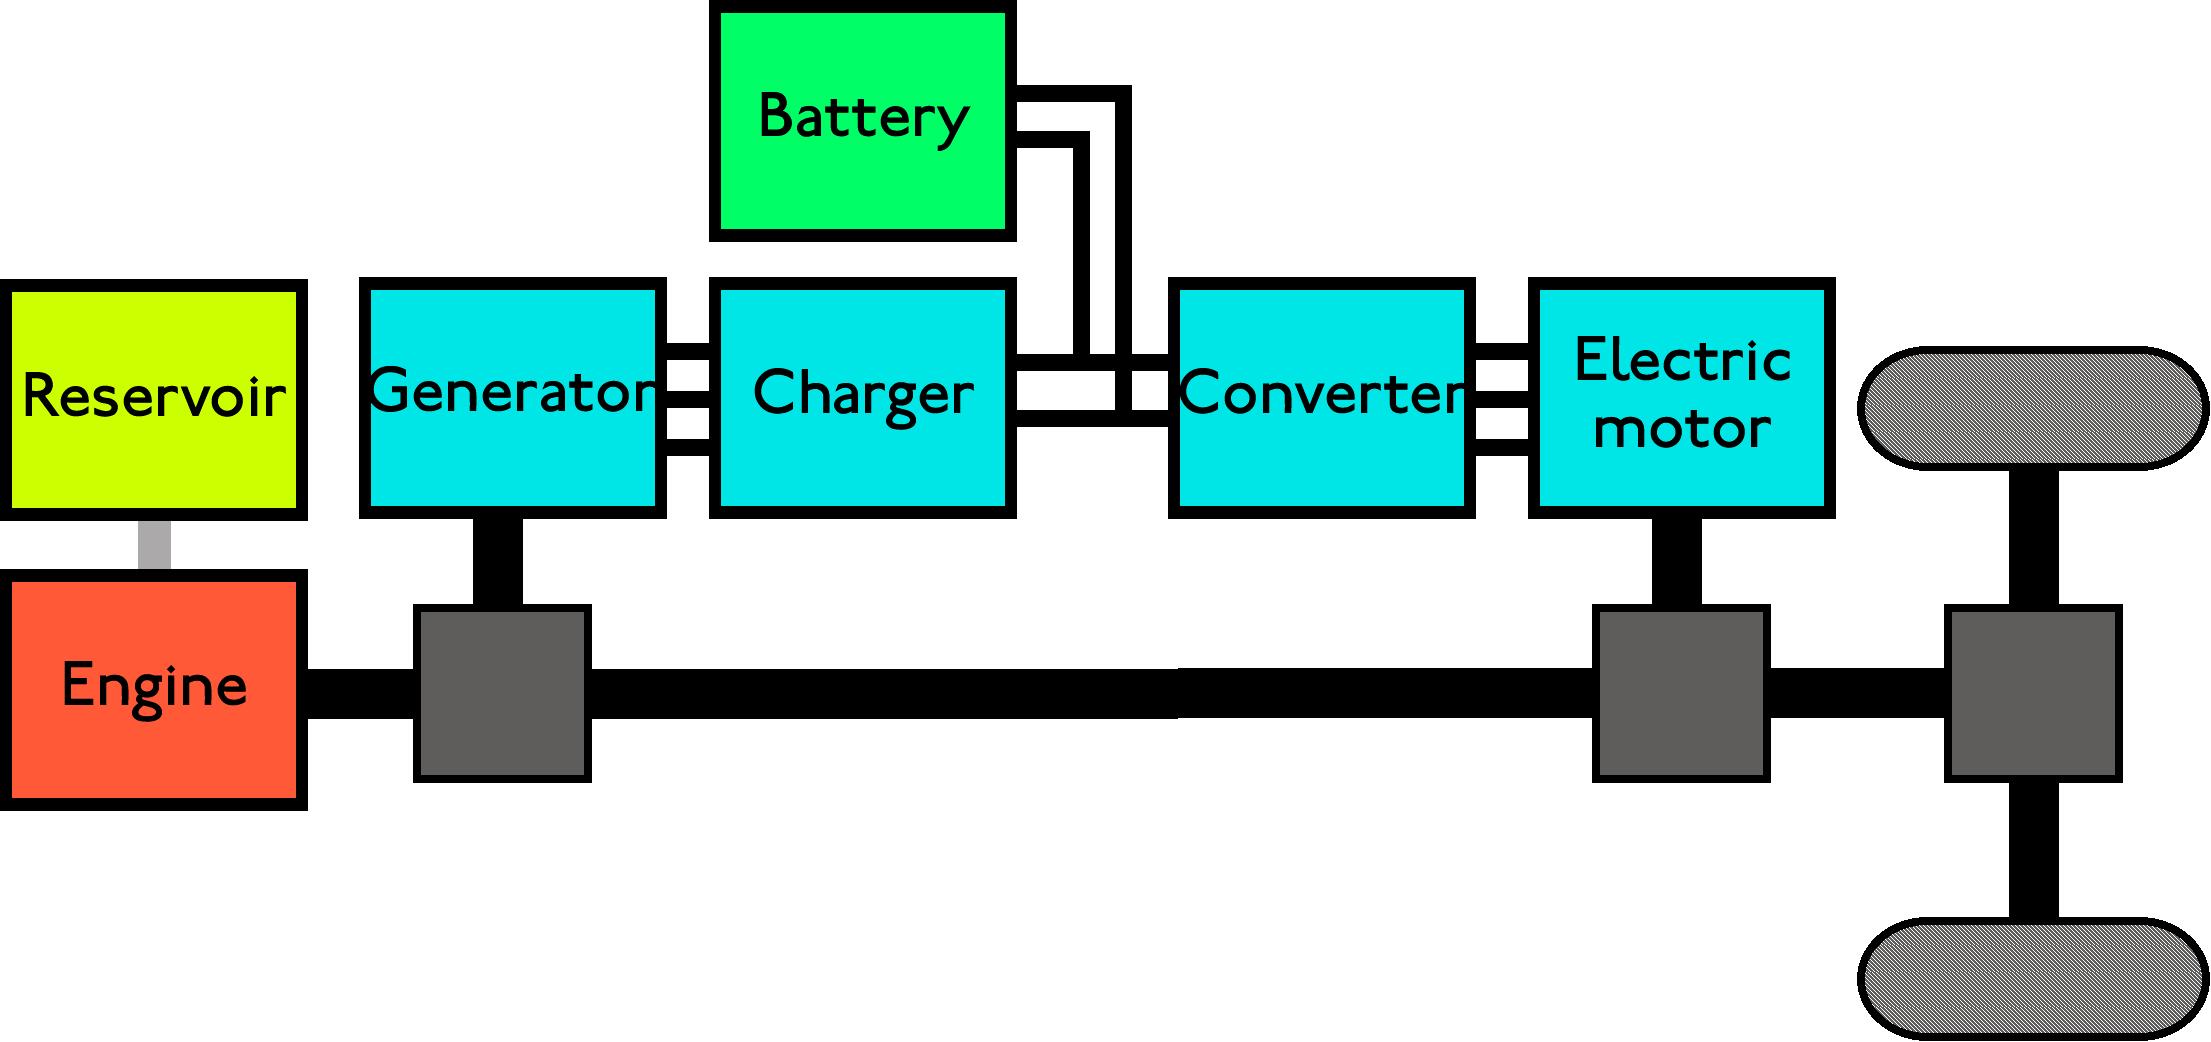 hybrid engine diagram power of a train best wiring library Hybrid Car Engine Diagram car engine evolution hybrid engine solar train by rohit